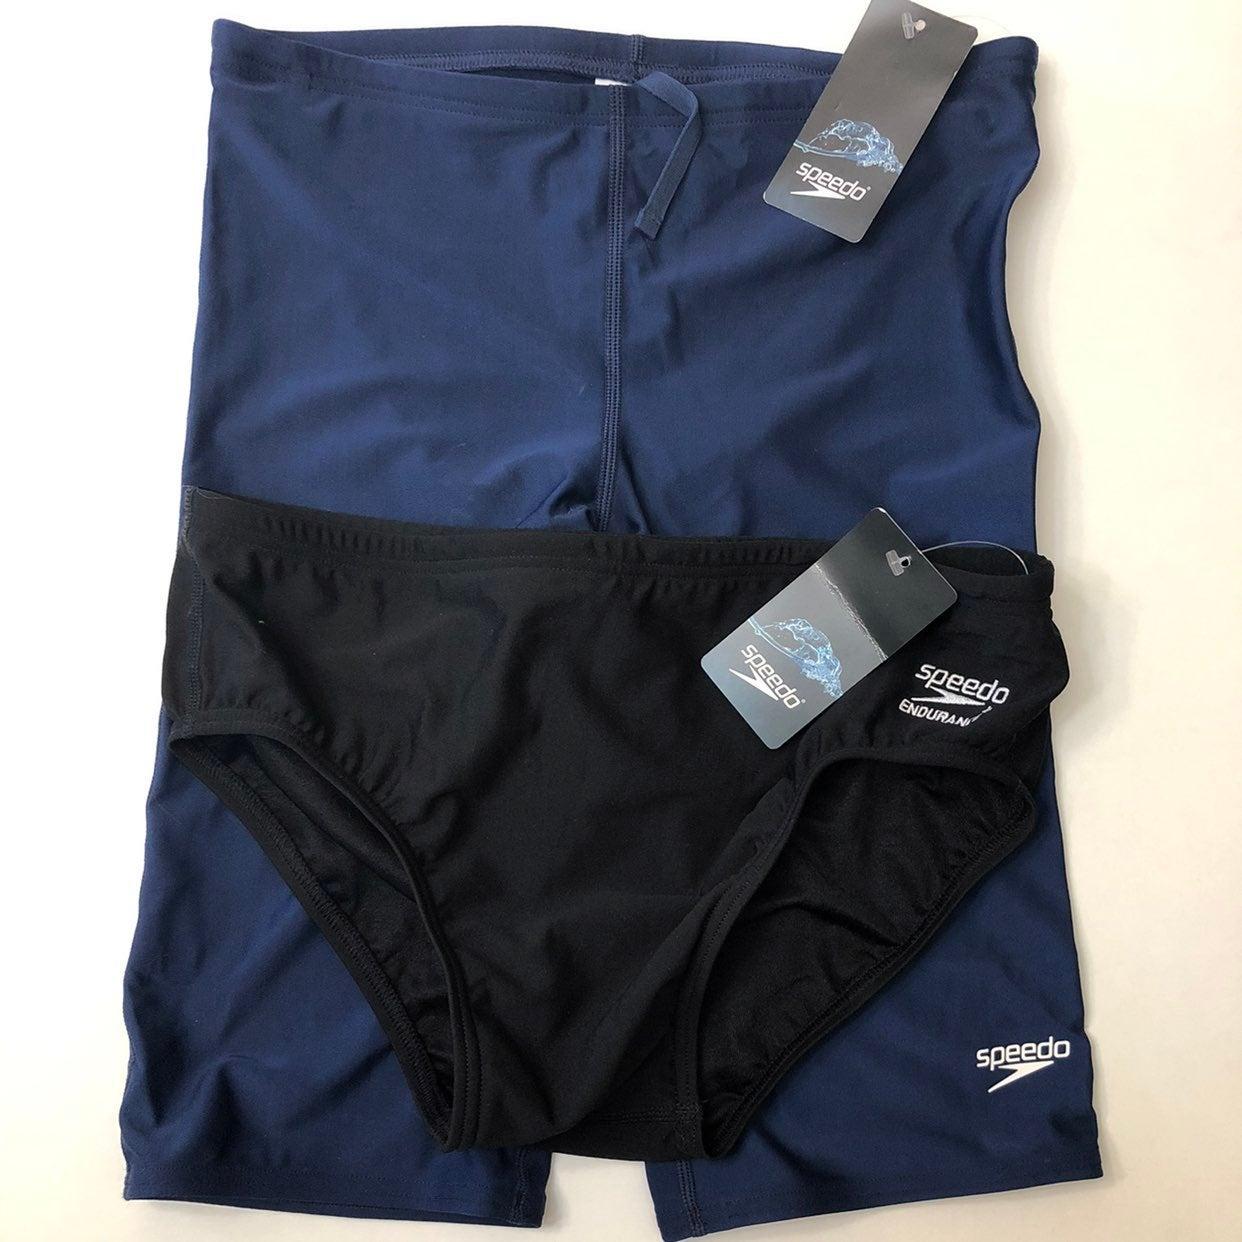 BRAND NEW Speedo Bathing Suits (Size 32)